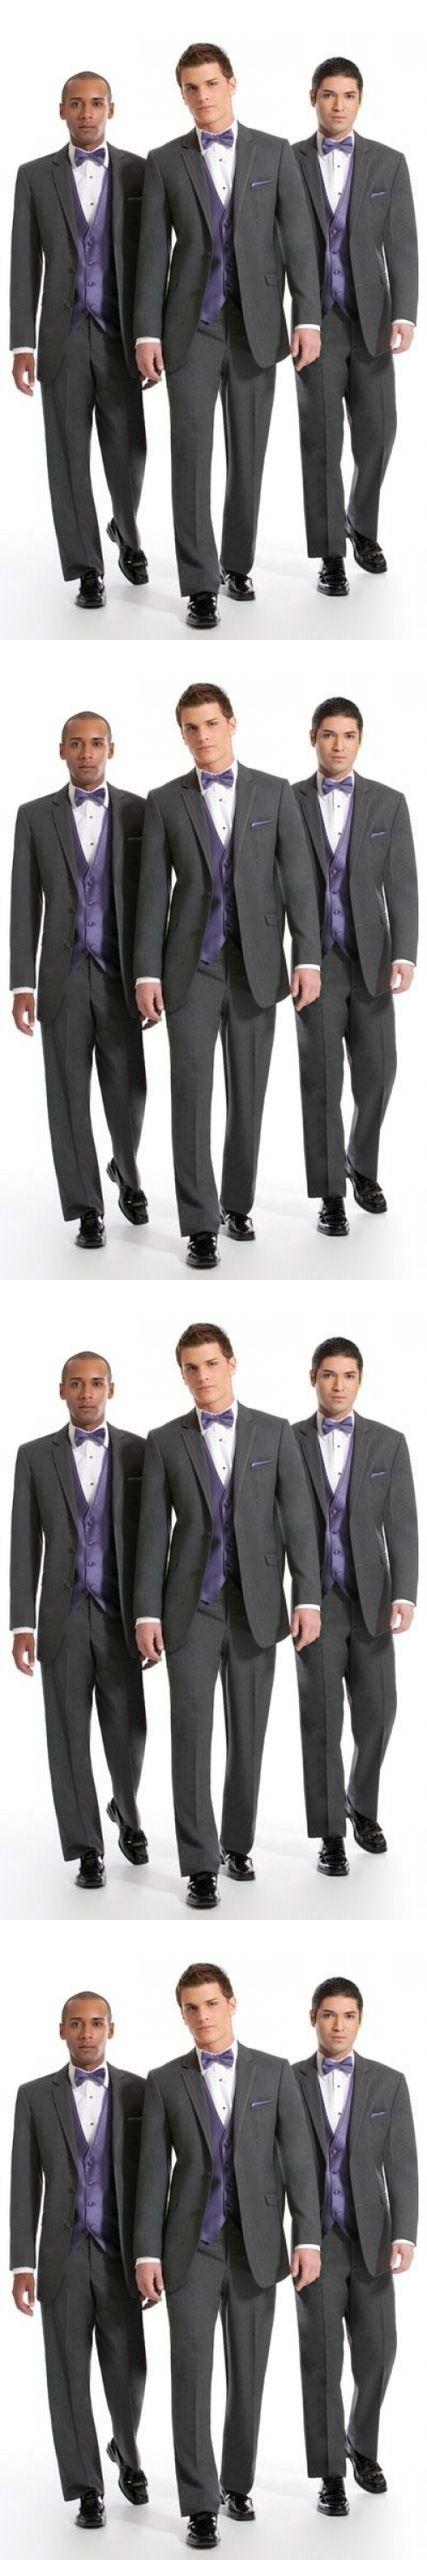 2017 Custom Made 2 Buttons Dark Grey Groom Tuxedos Notch Lapel Best Man Groomsman Men Wedding Suits (Jacket+Pants+Vest+Tie)